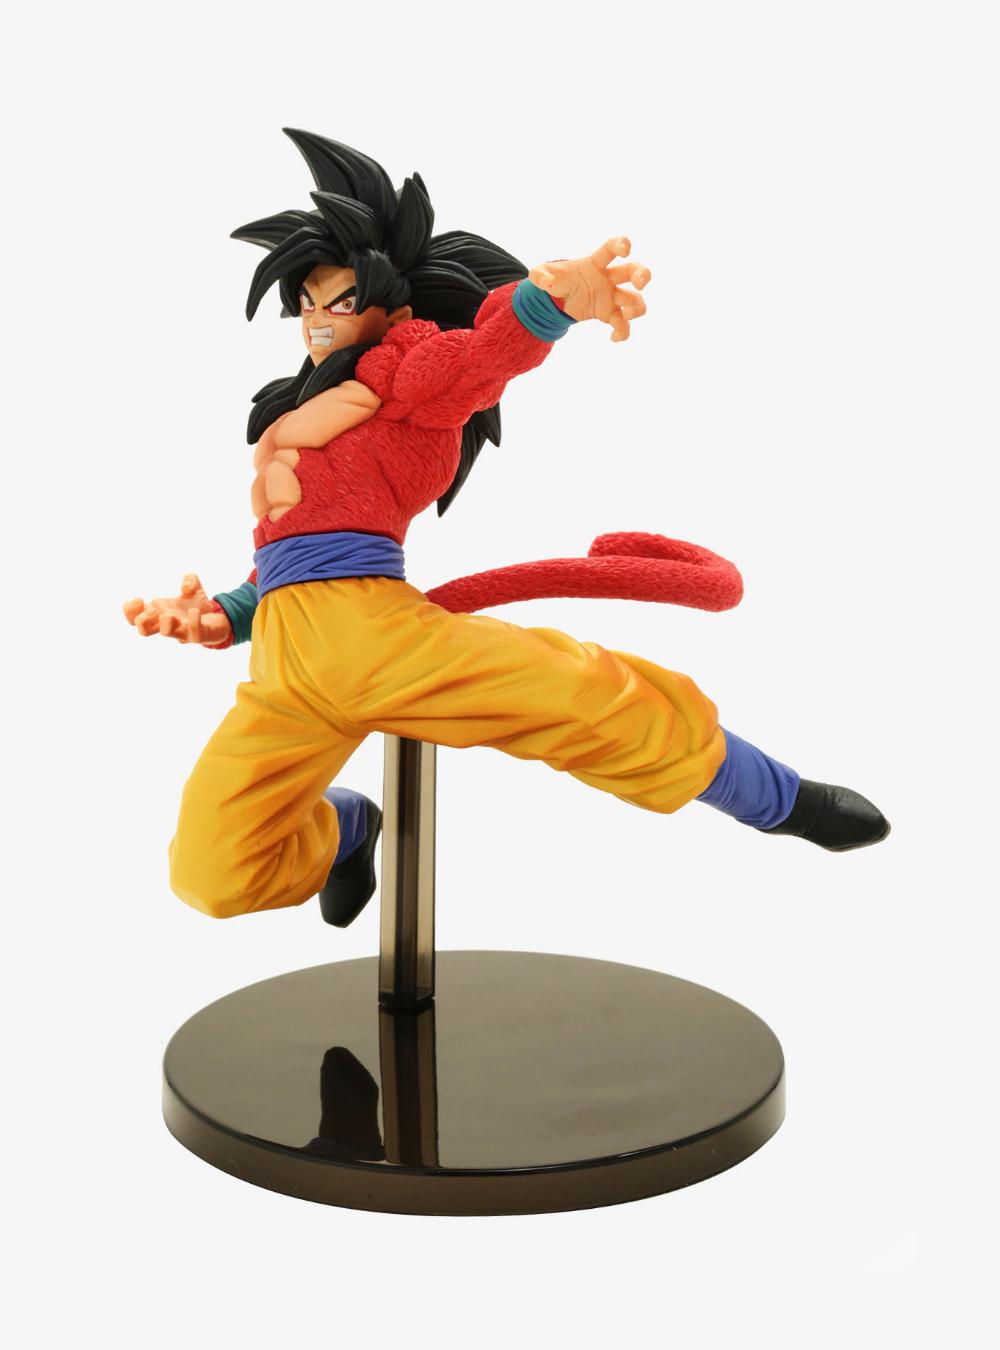 Dragon Ball Z Fes Special Super Saiyan Son Goku 4 Figure Goku 4 Super Saiyan 4 Goku Super Saiyan